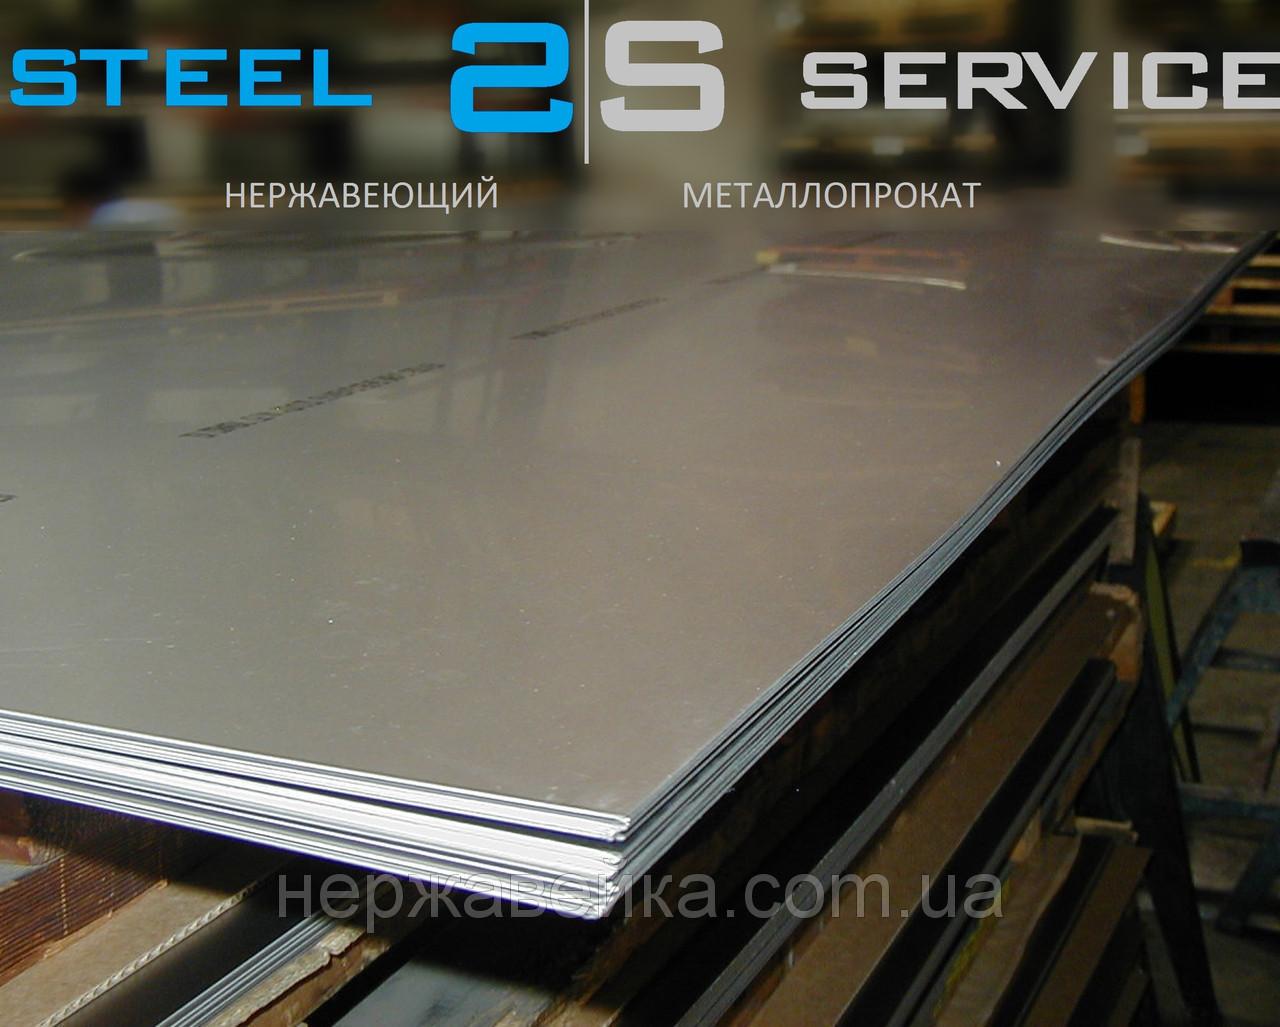 Нержавейка лист 3х1250х2500мм AISI 430(12Х17) 2B - матовый, технический